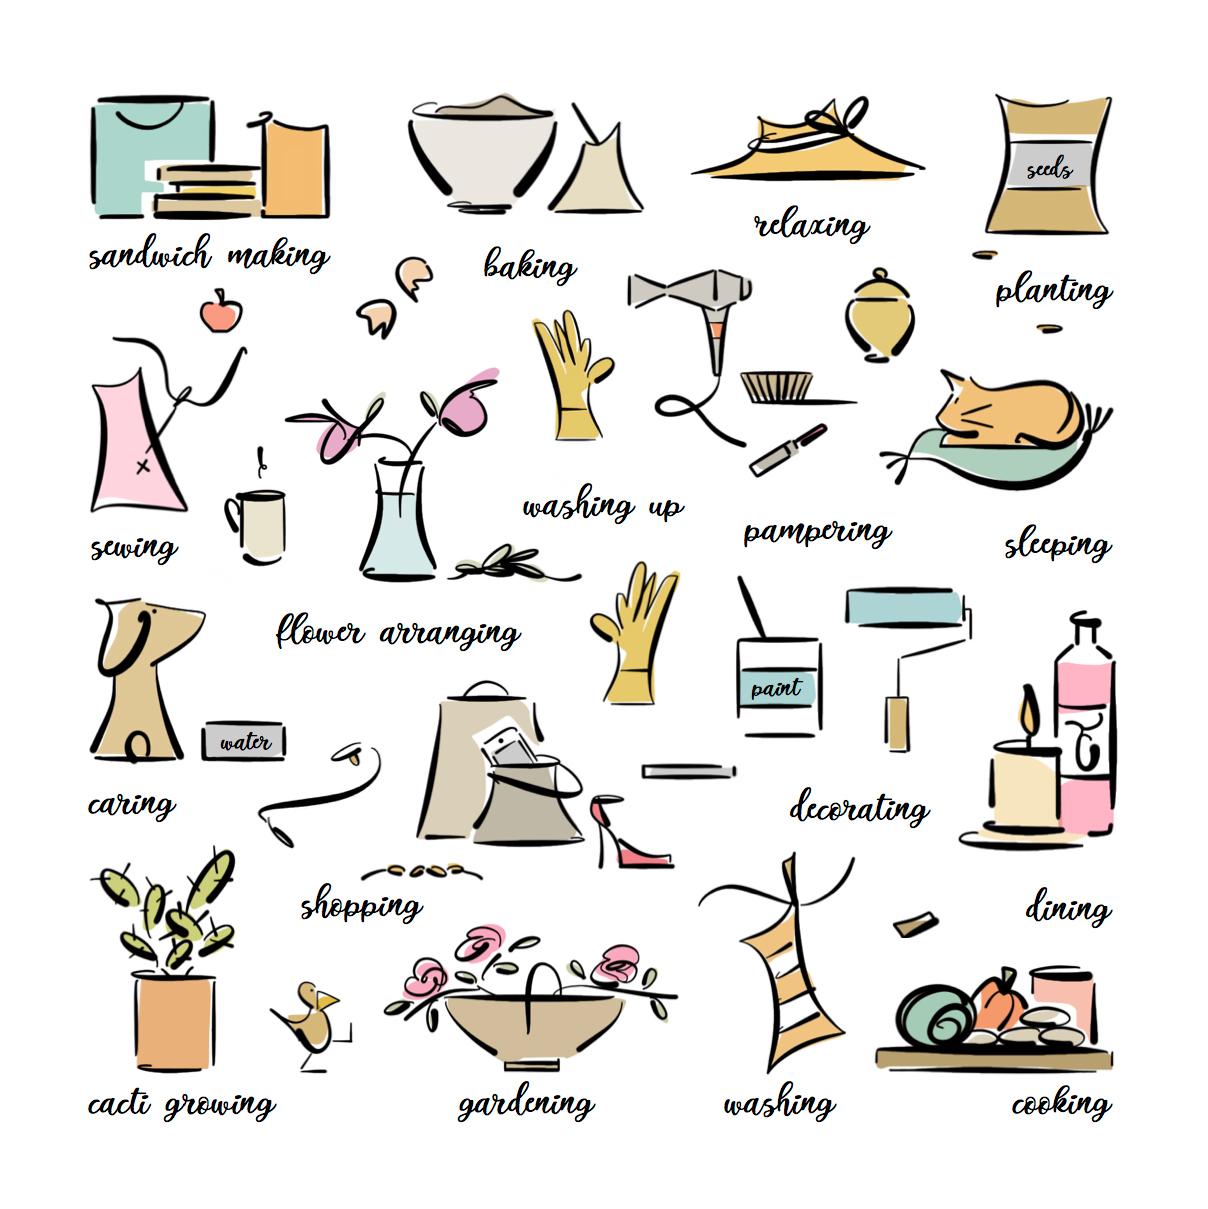 Every Day Activities Illustration.jpg